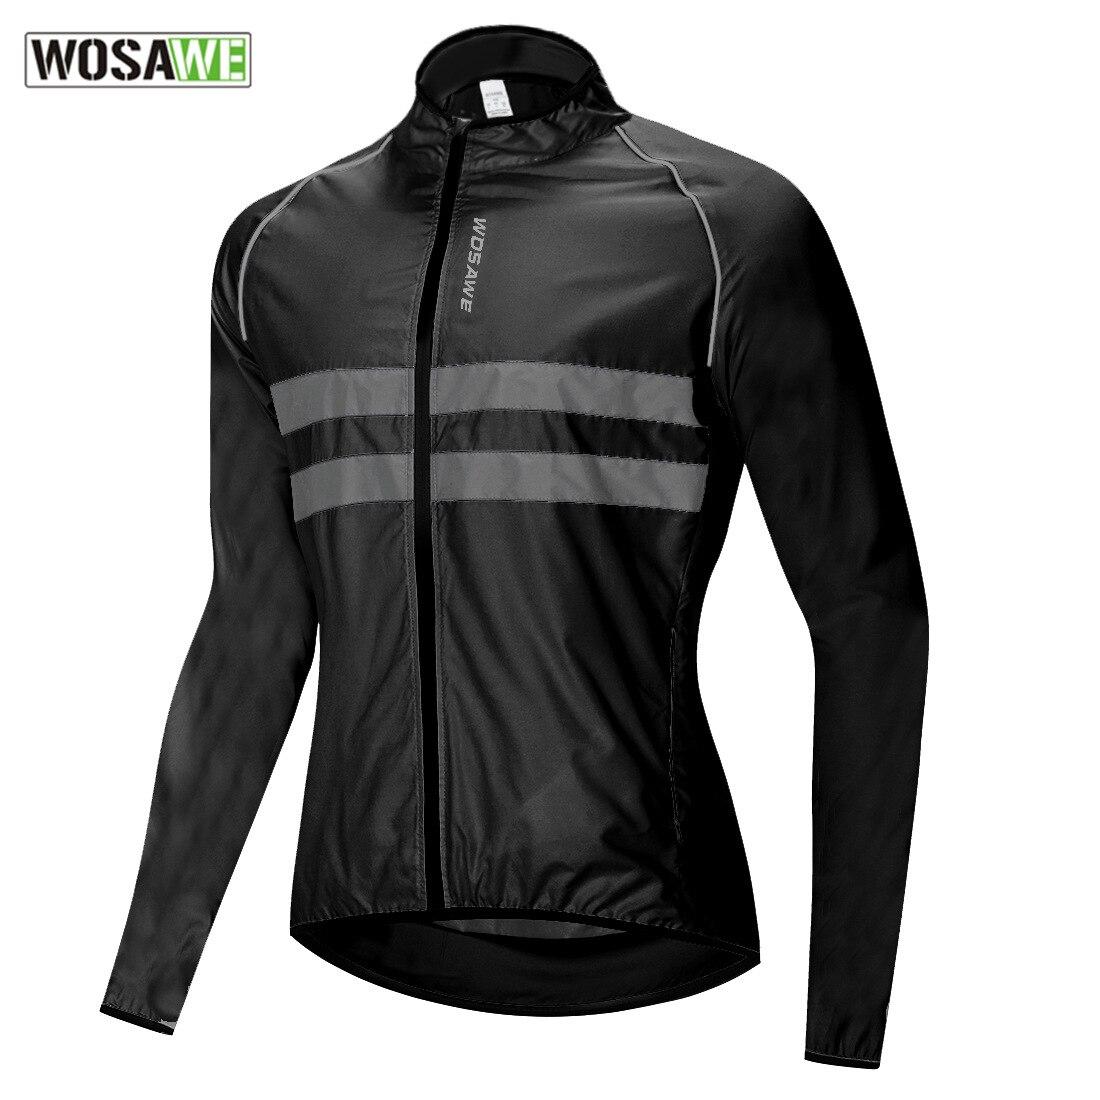 Wosawe-chaqueta De Ciclismo Ultraligera Reflectante Para Hombre... Cazadora Larga Impermeable a Prueba...